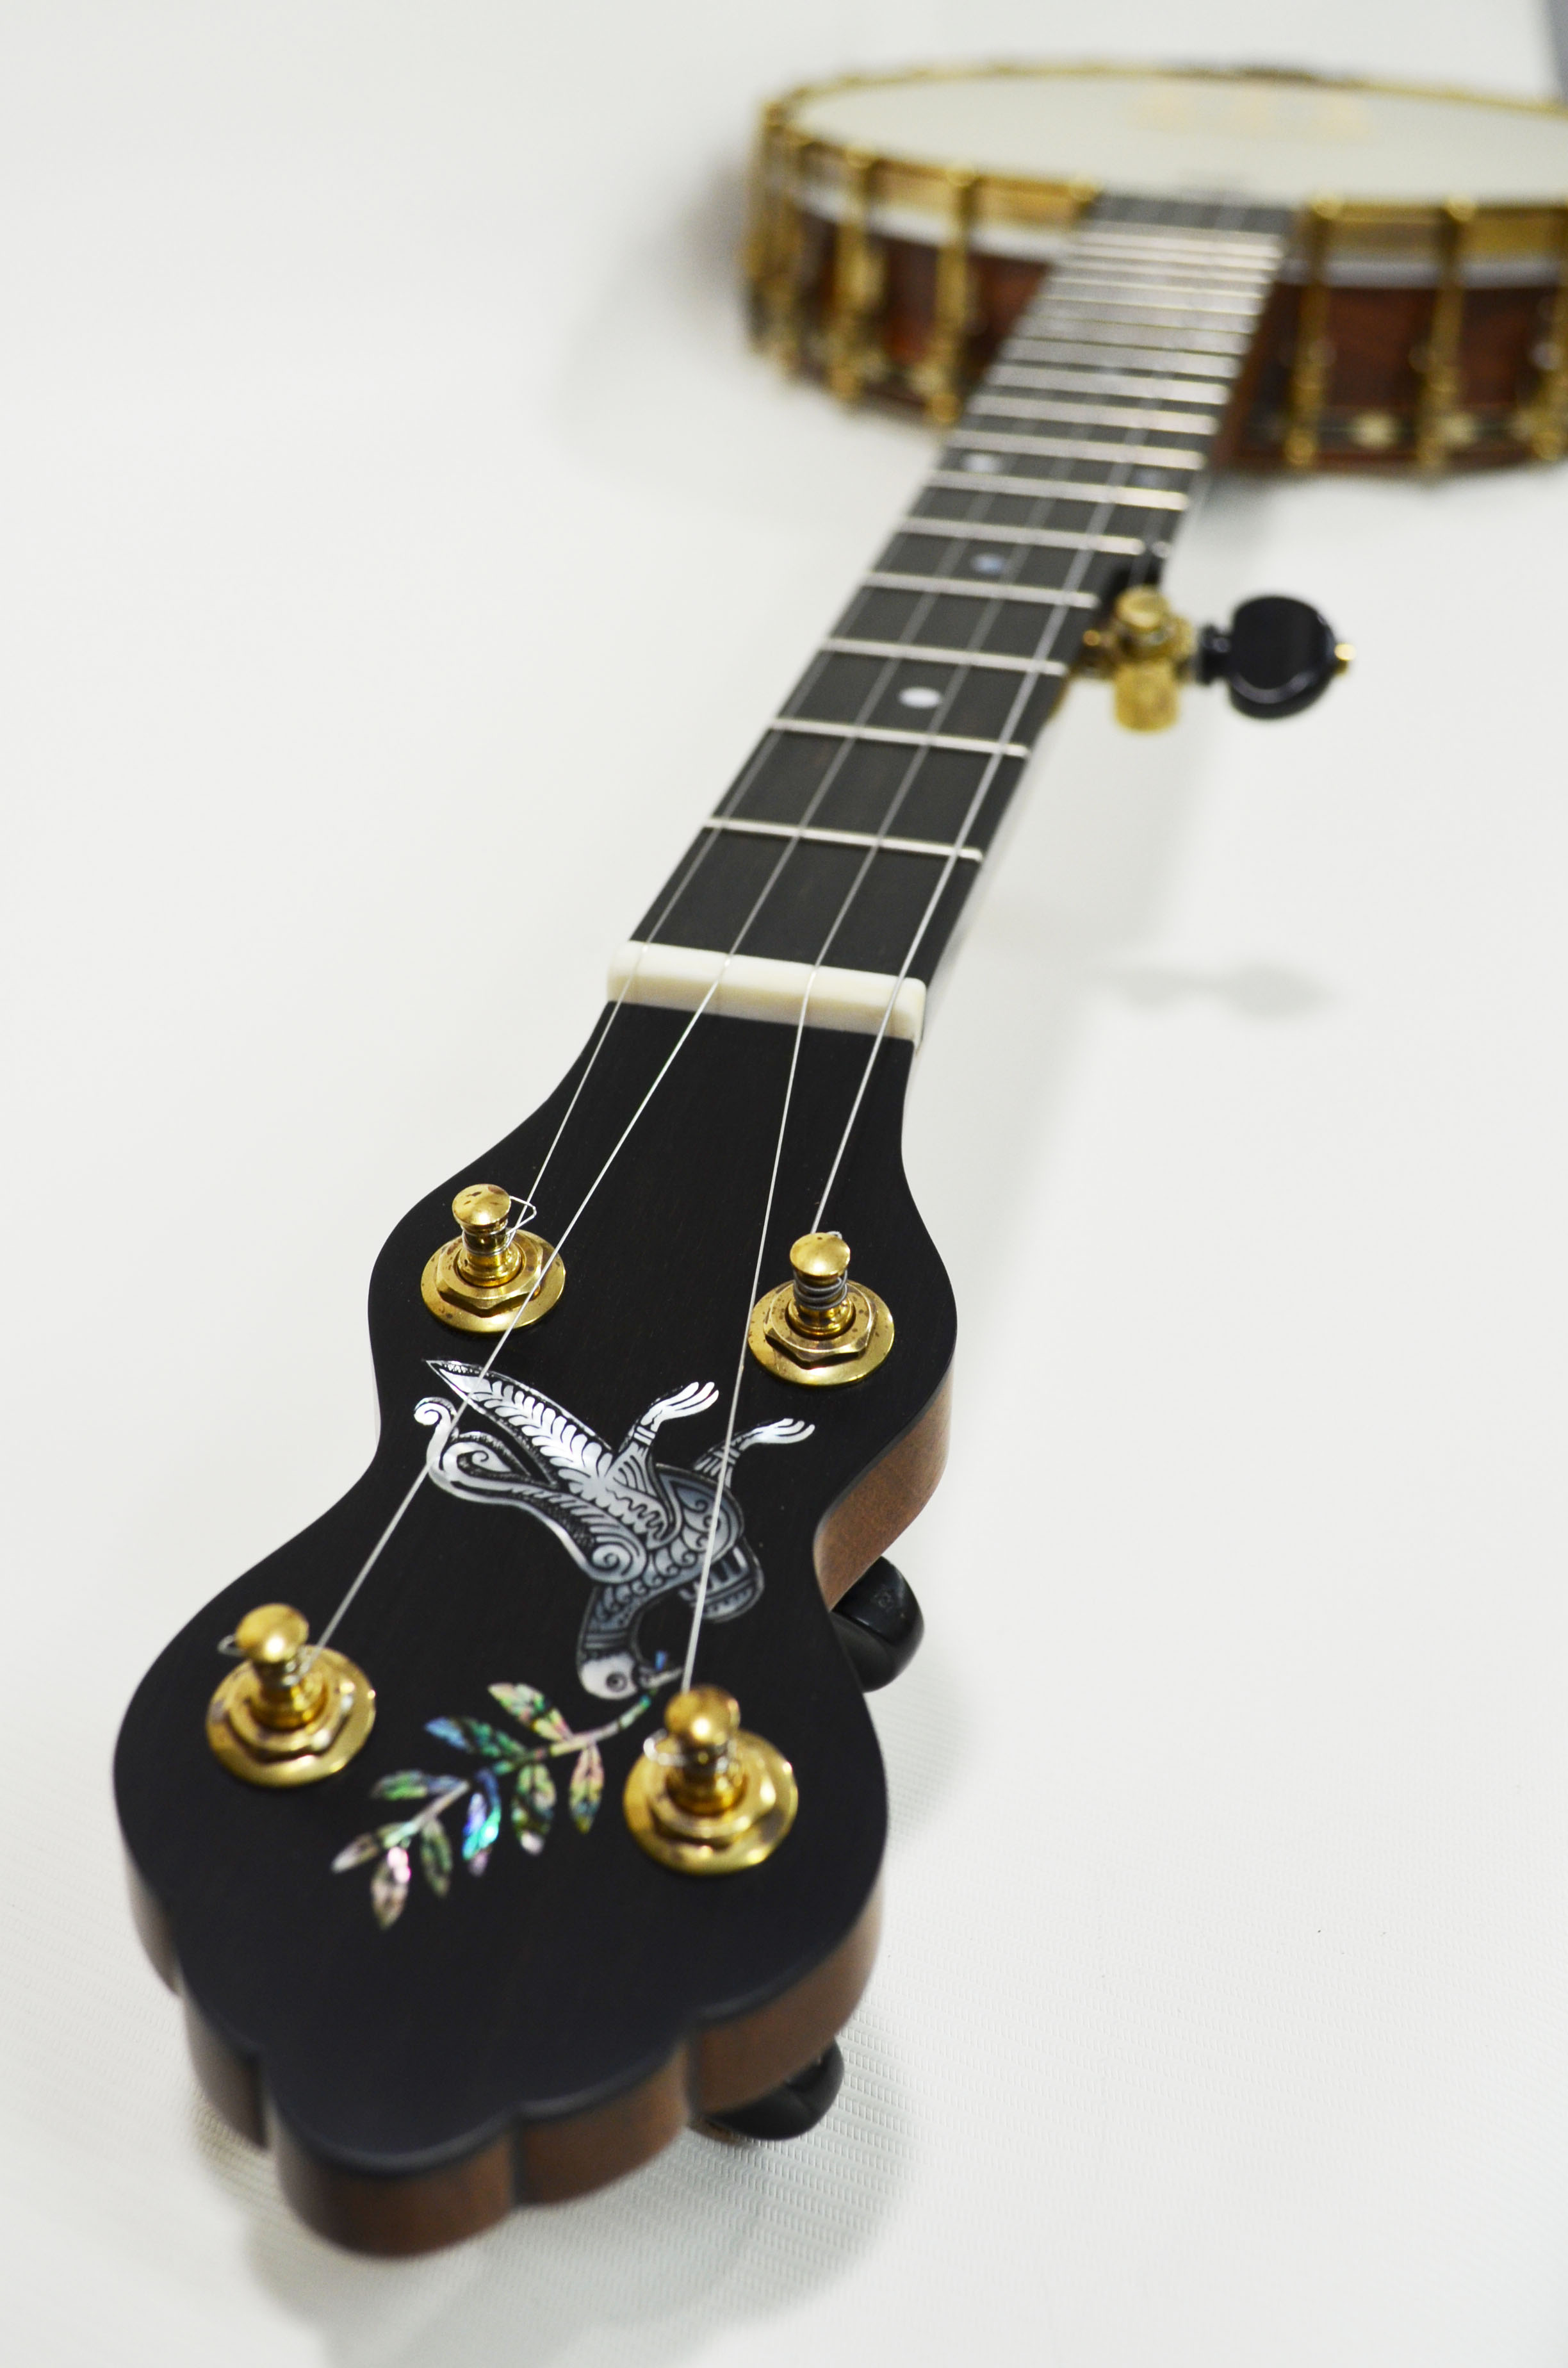 Custom L model with dove engraving